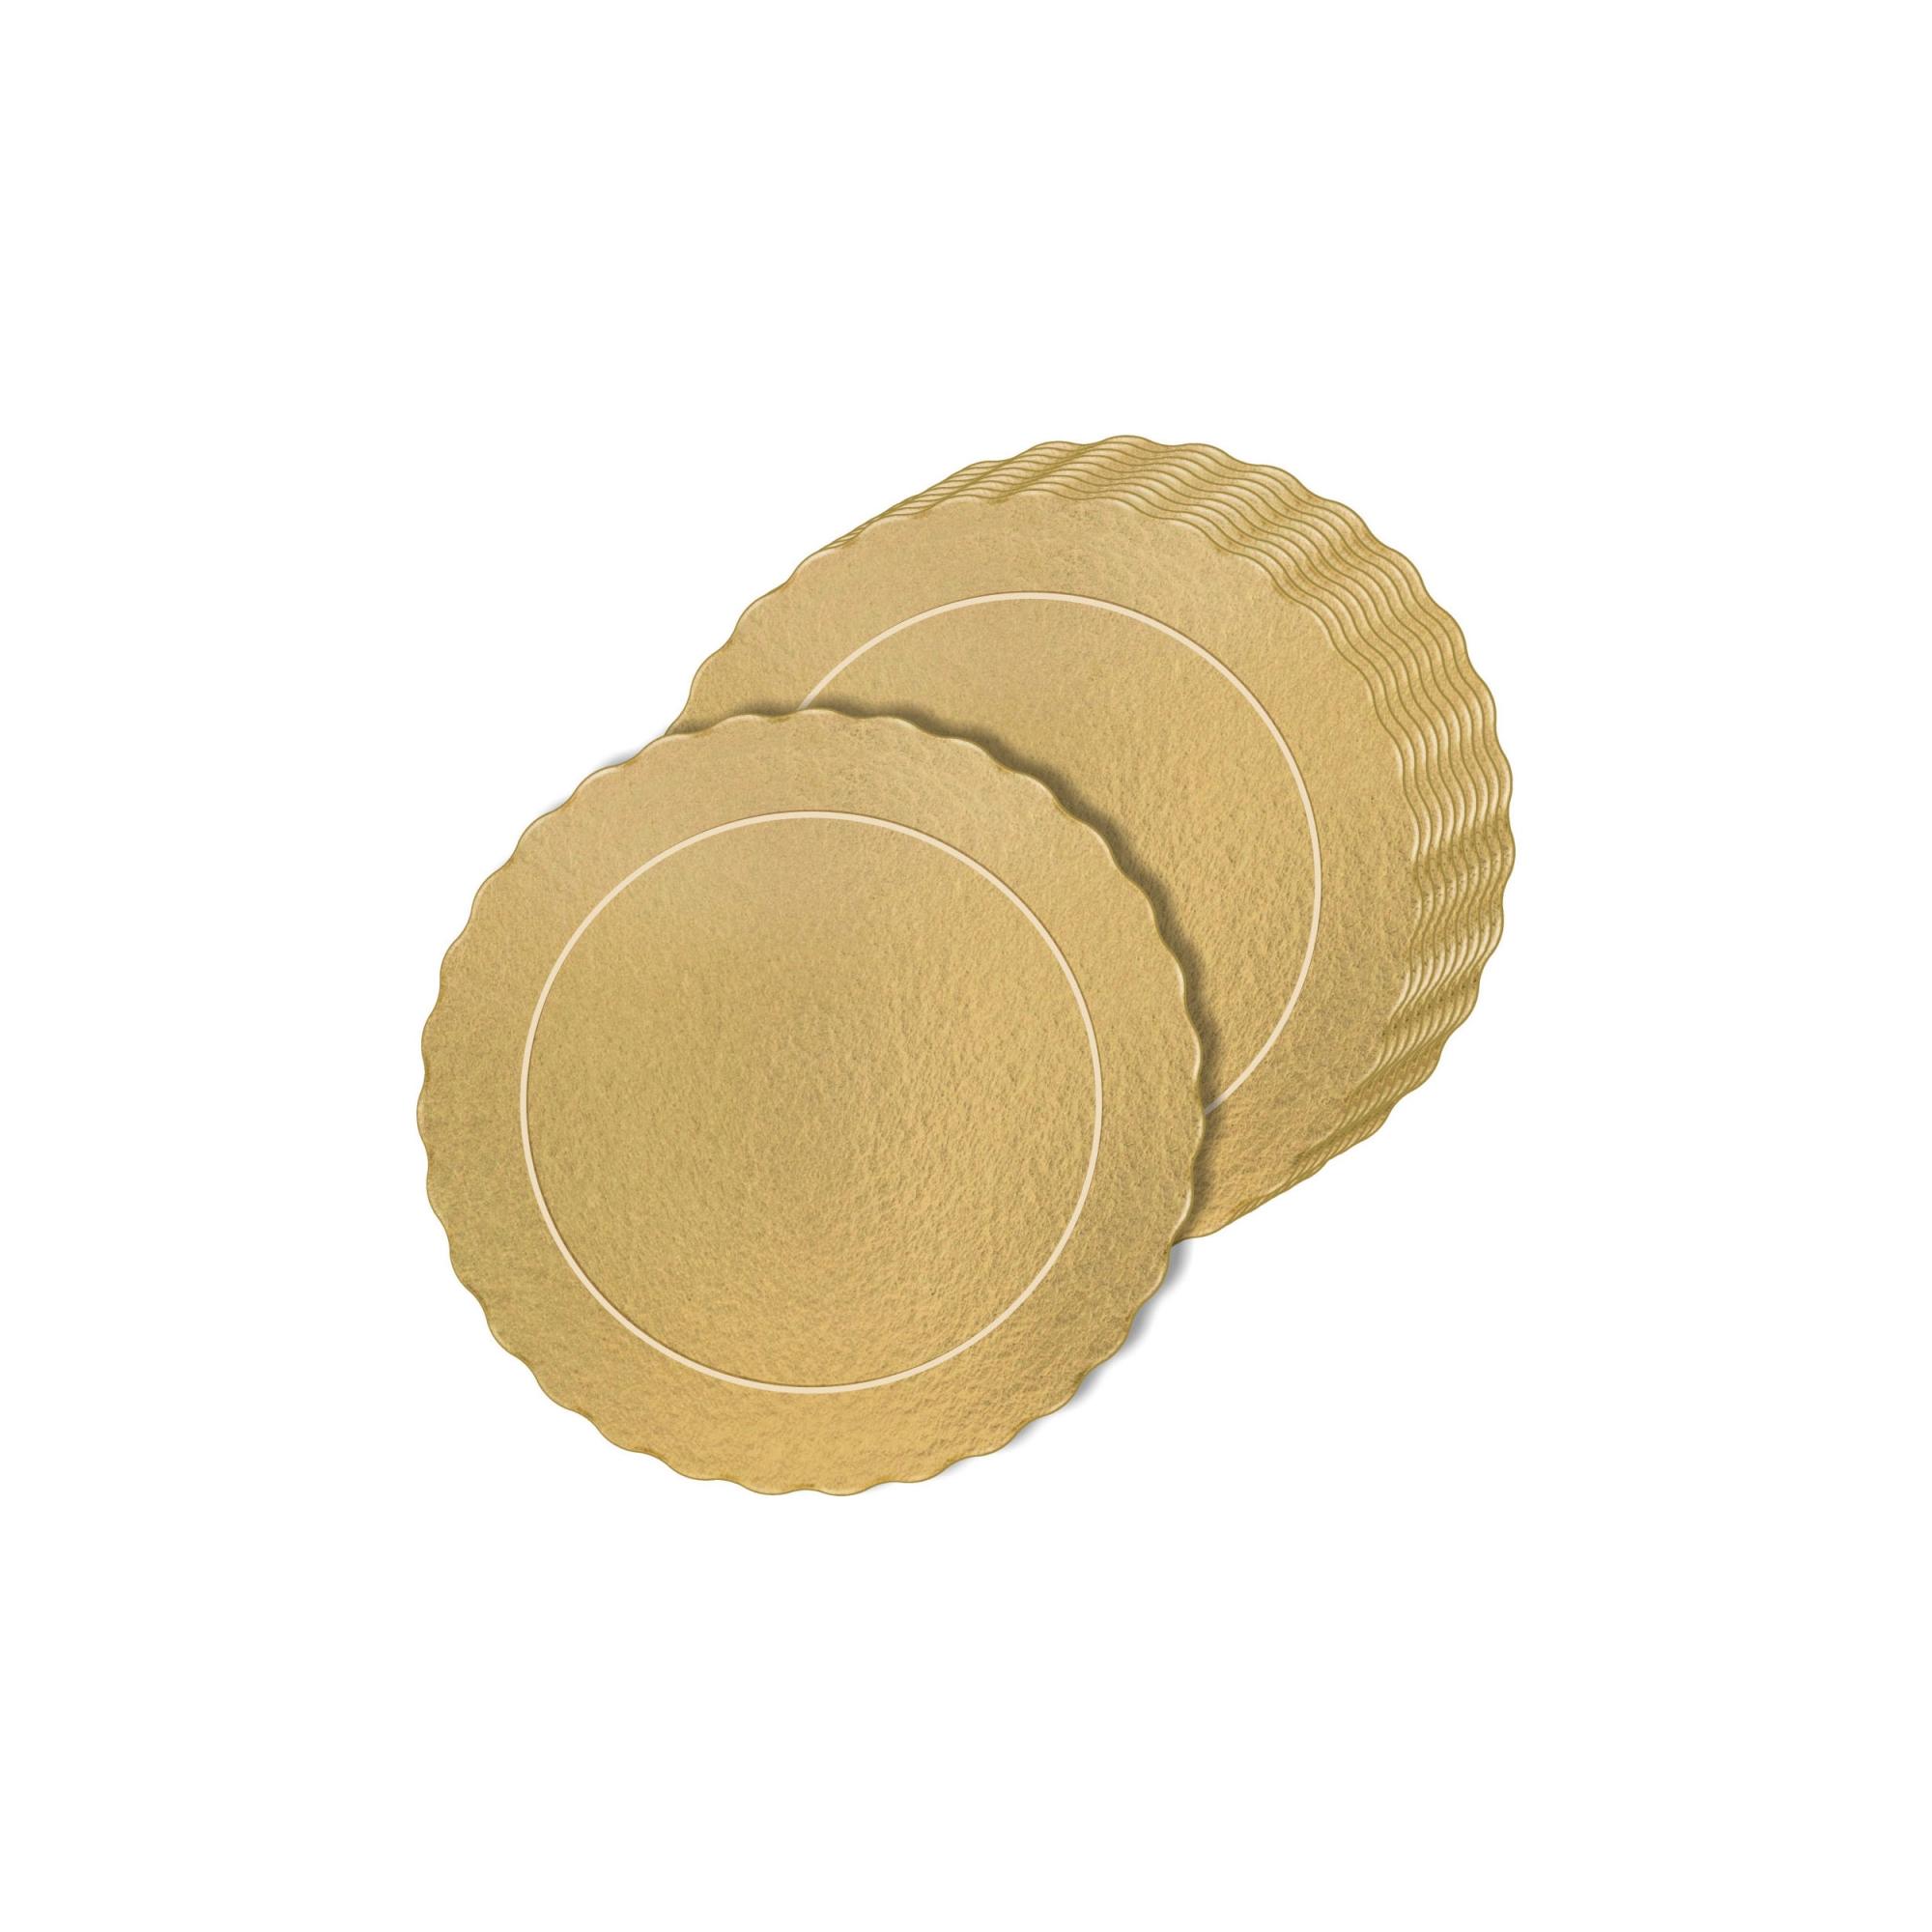 50 Bases Laminadas, Suporte P/ Bolo, 12cm - Ouro